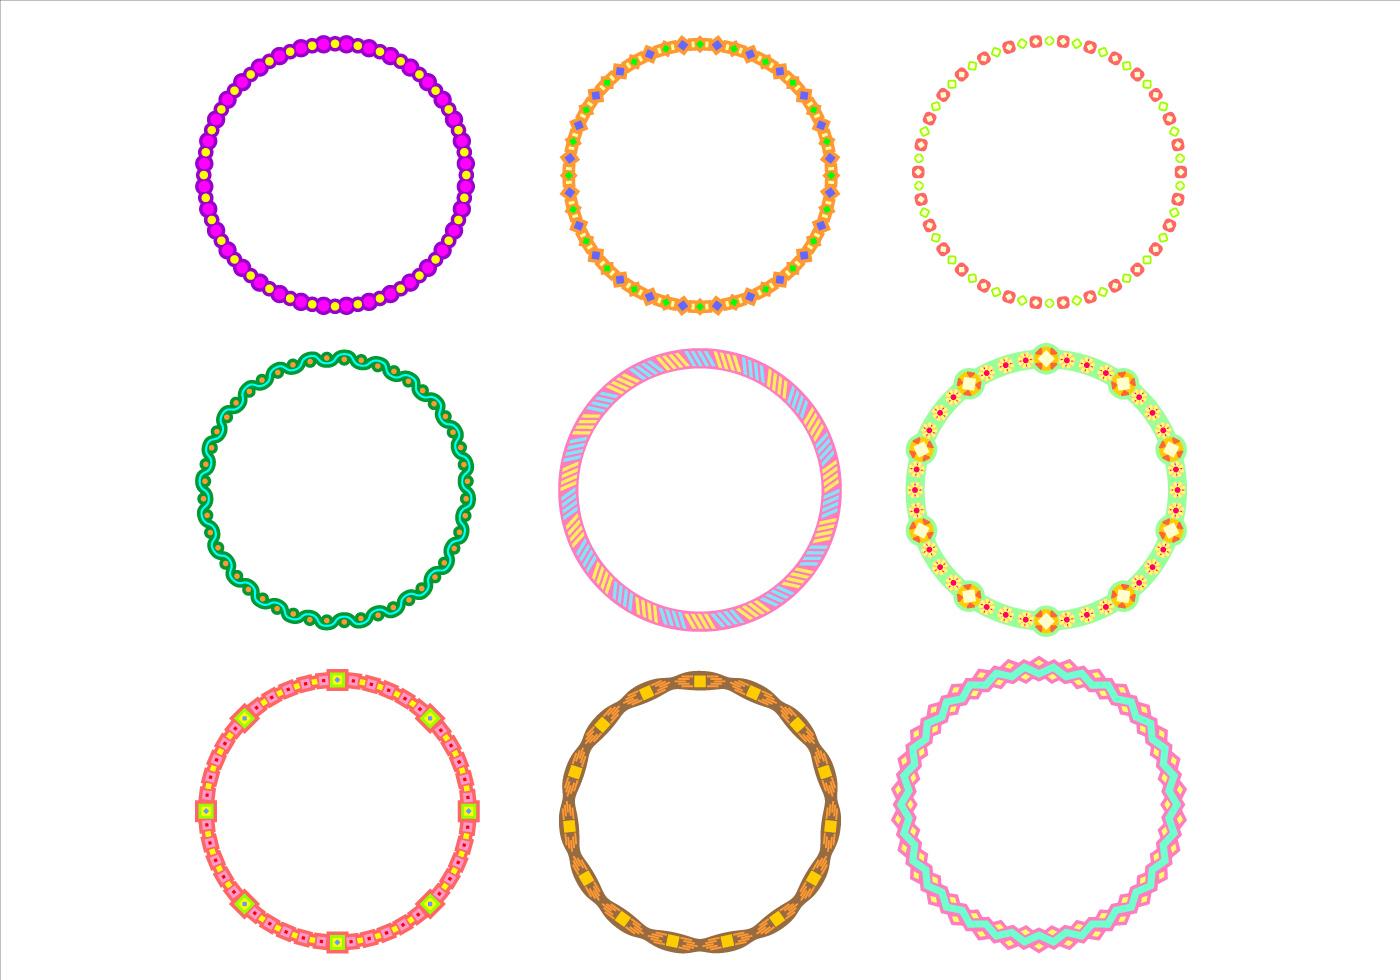 Cute Circle Border Funky Frames Free Vector - Download ...